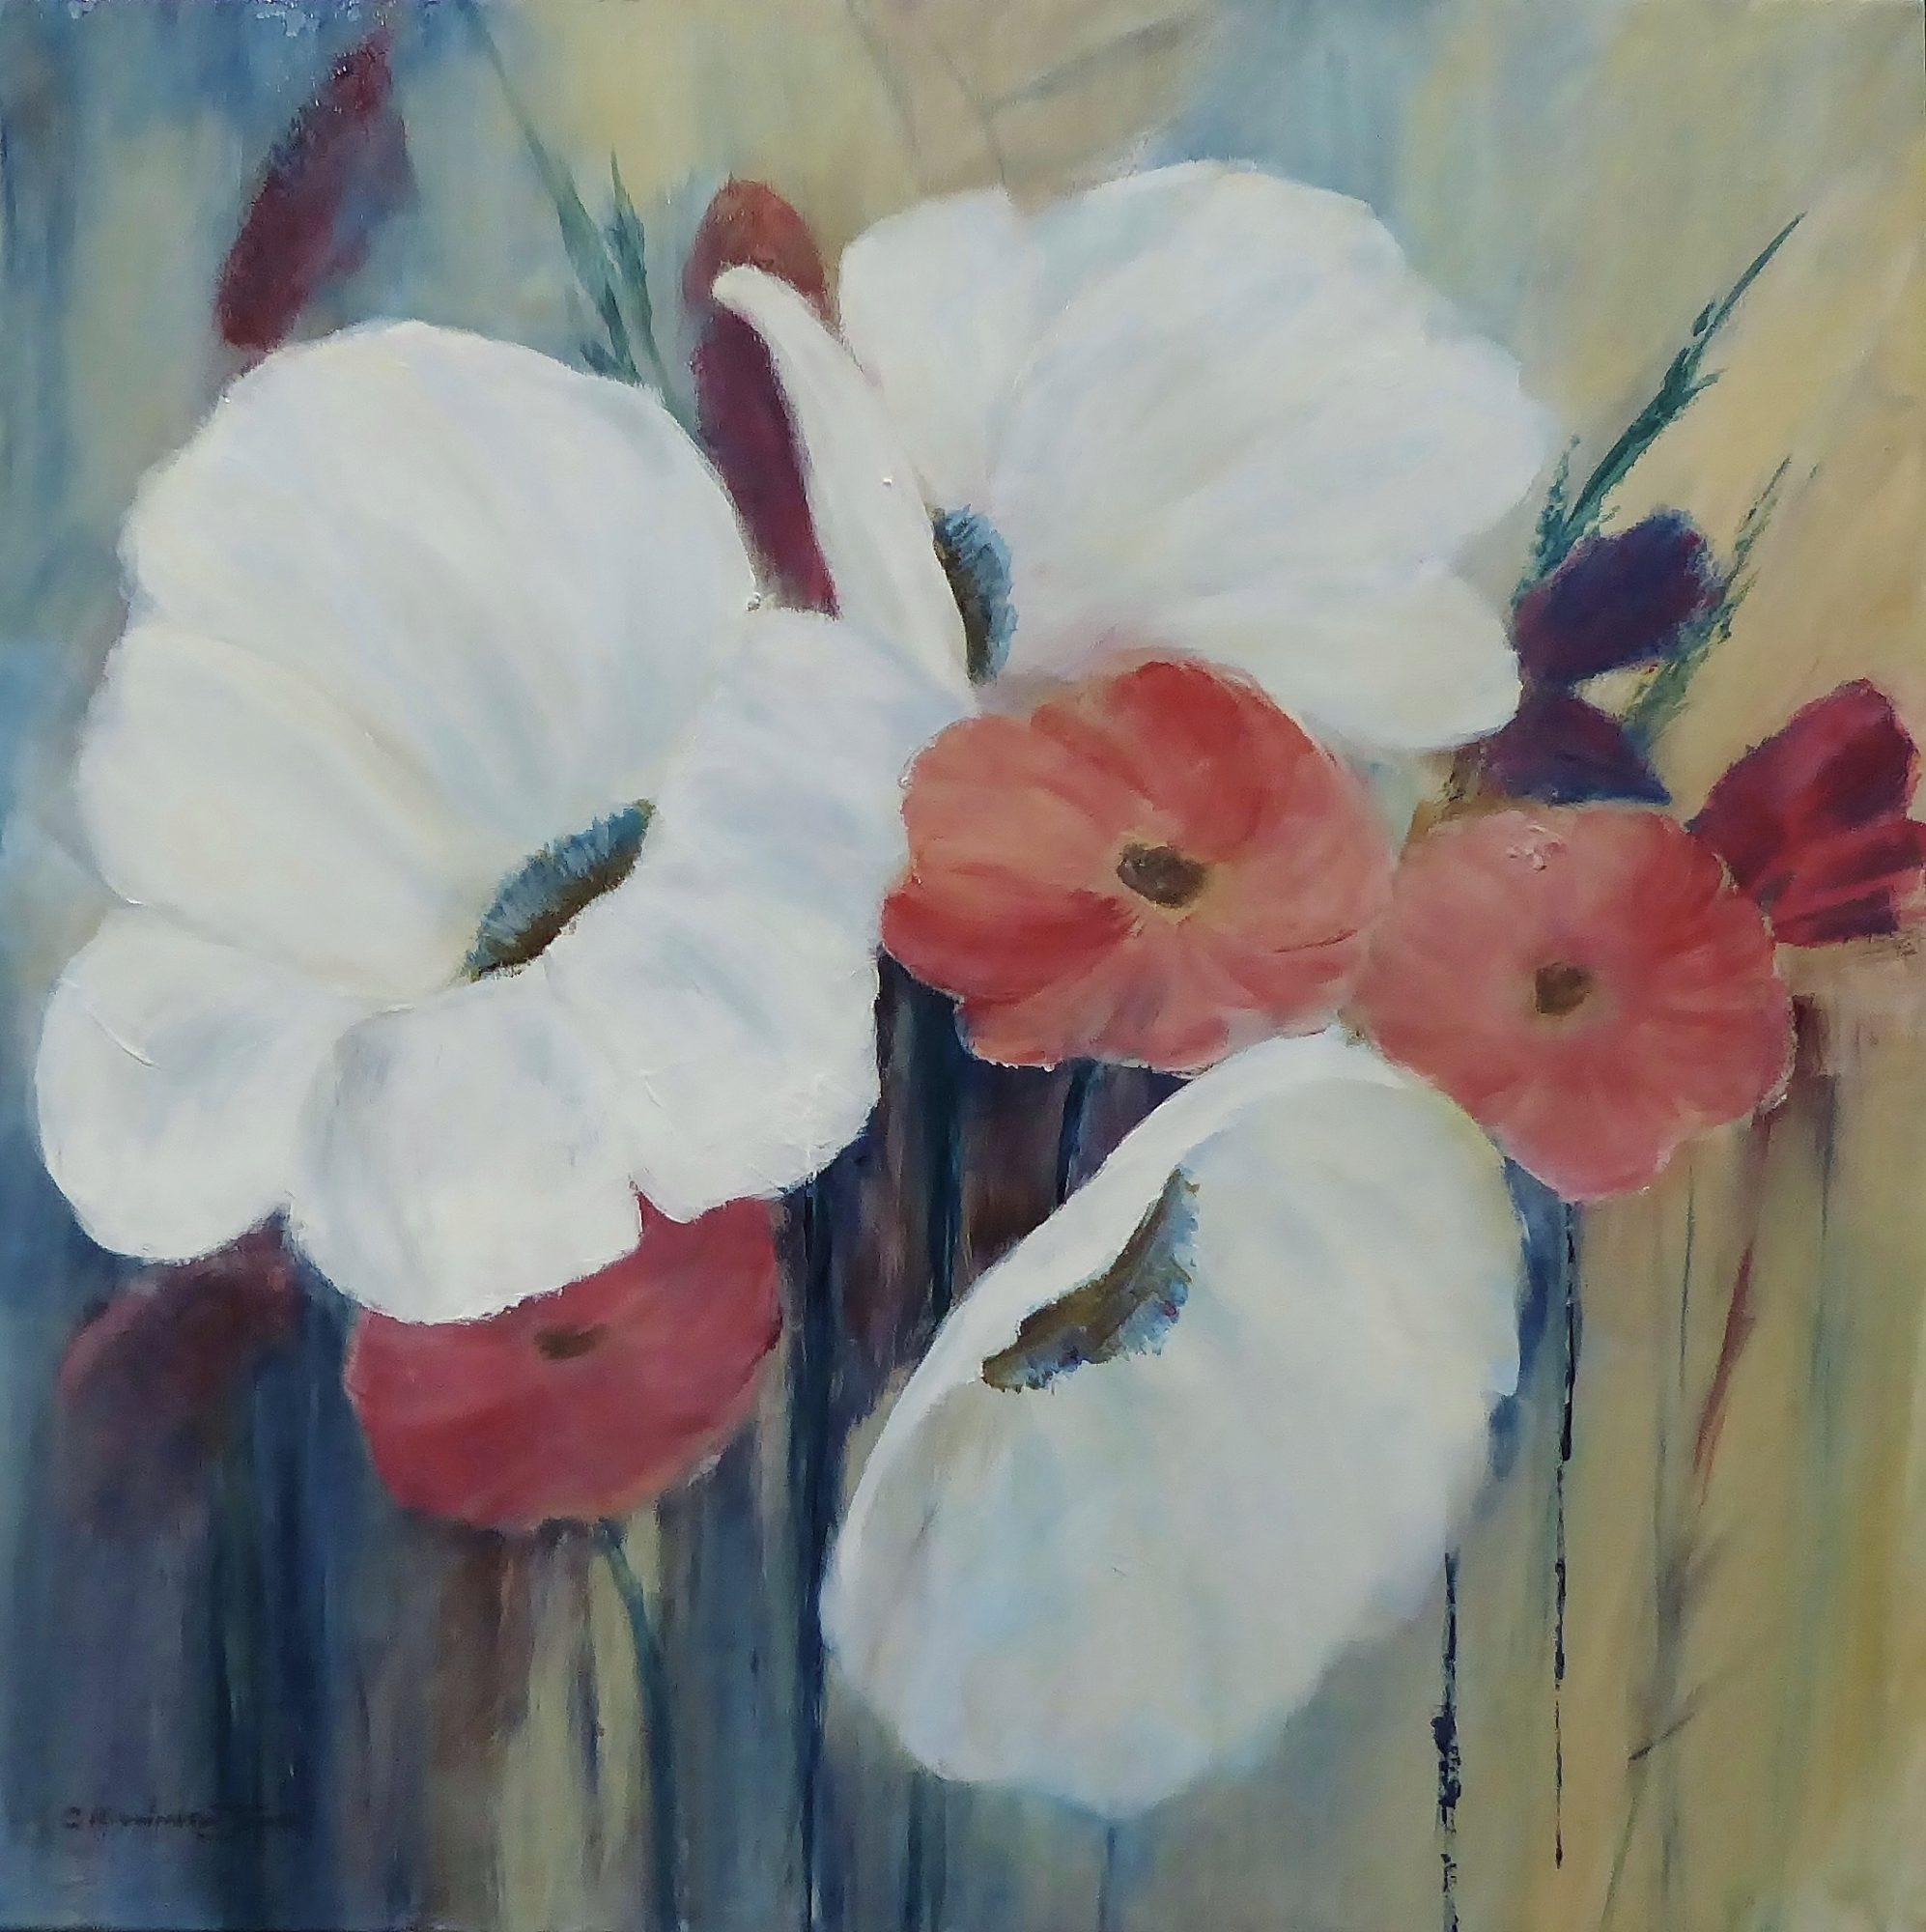 Garden Delights, Clare Riddington Jones, 40cm x 40cm, Acrylic